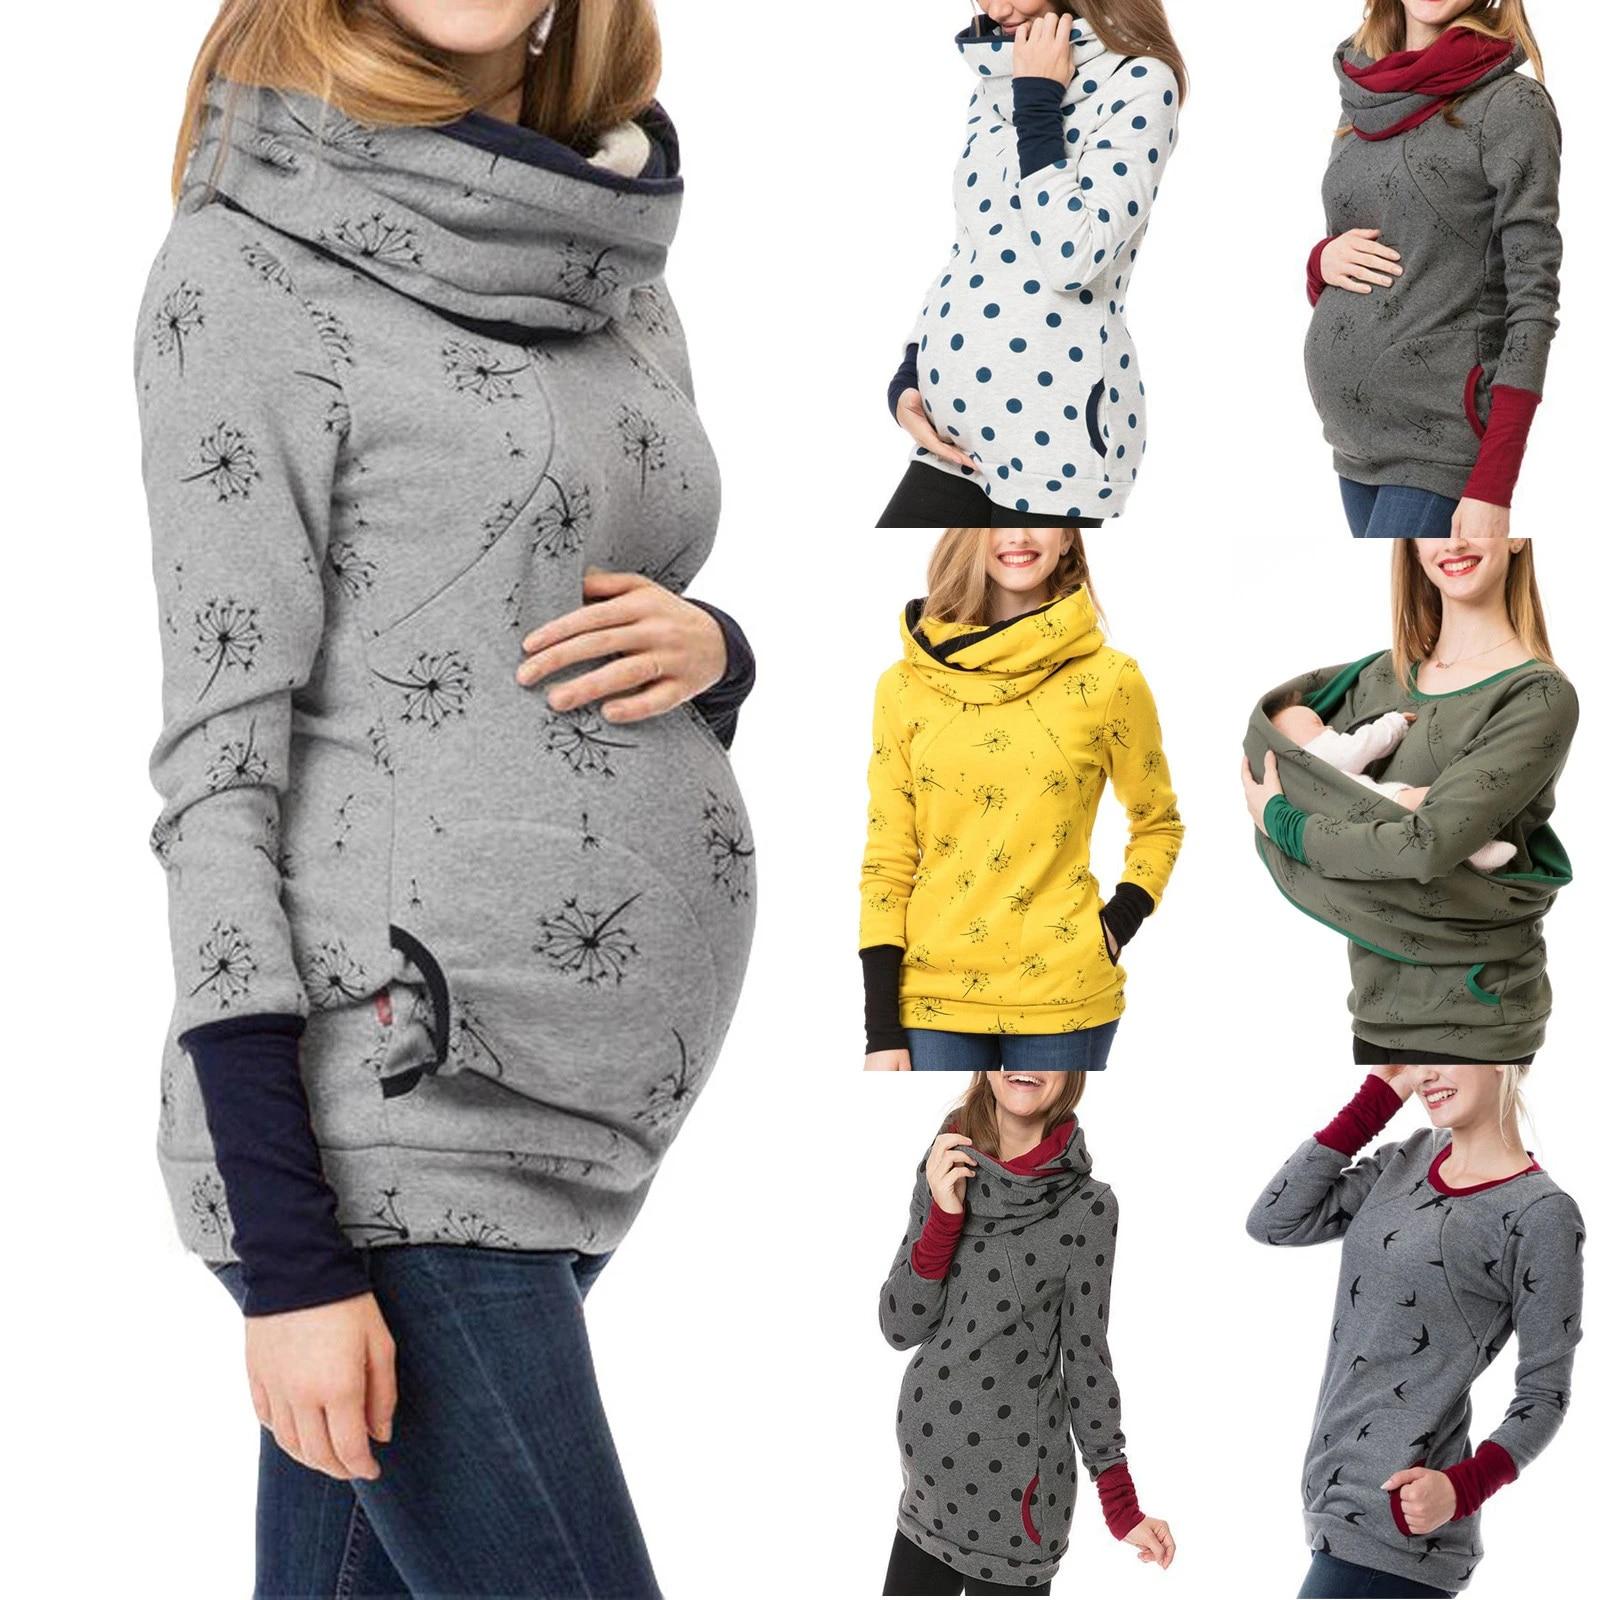 New Maternity Nursing Hoodie Sweatshirt Winter Autumn Pregnancy Clothes Pregnant Women Breastfeeding Sweater Shirts T Shirt Top Hoodies Aliexpress